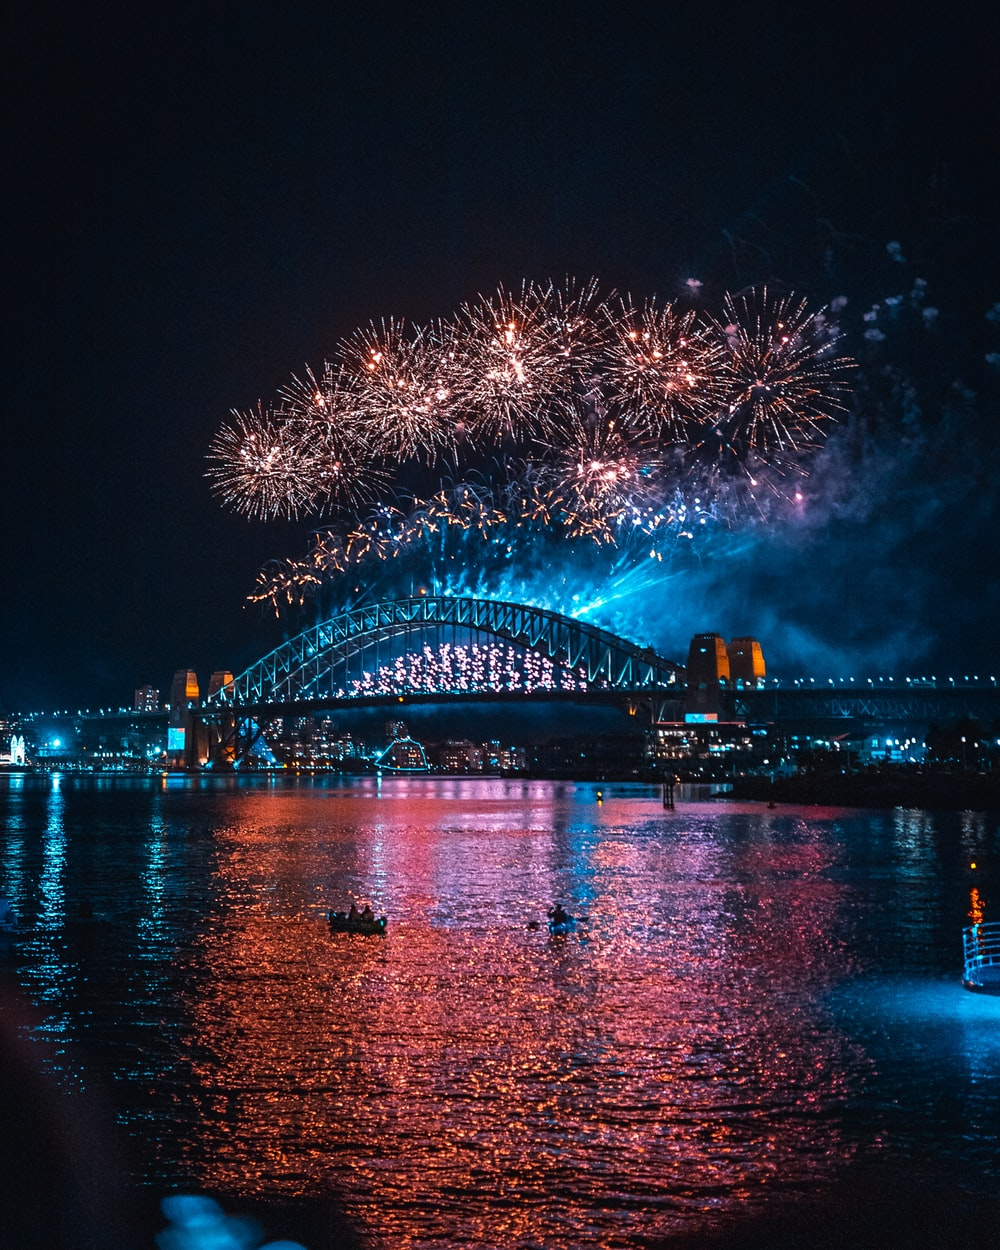 fireworks display near bridge